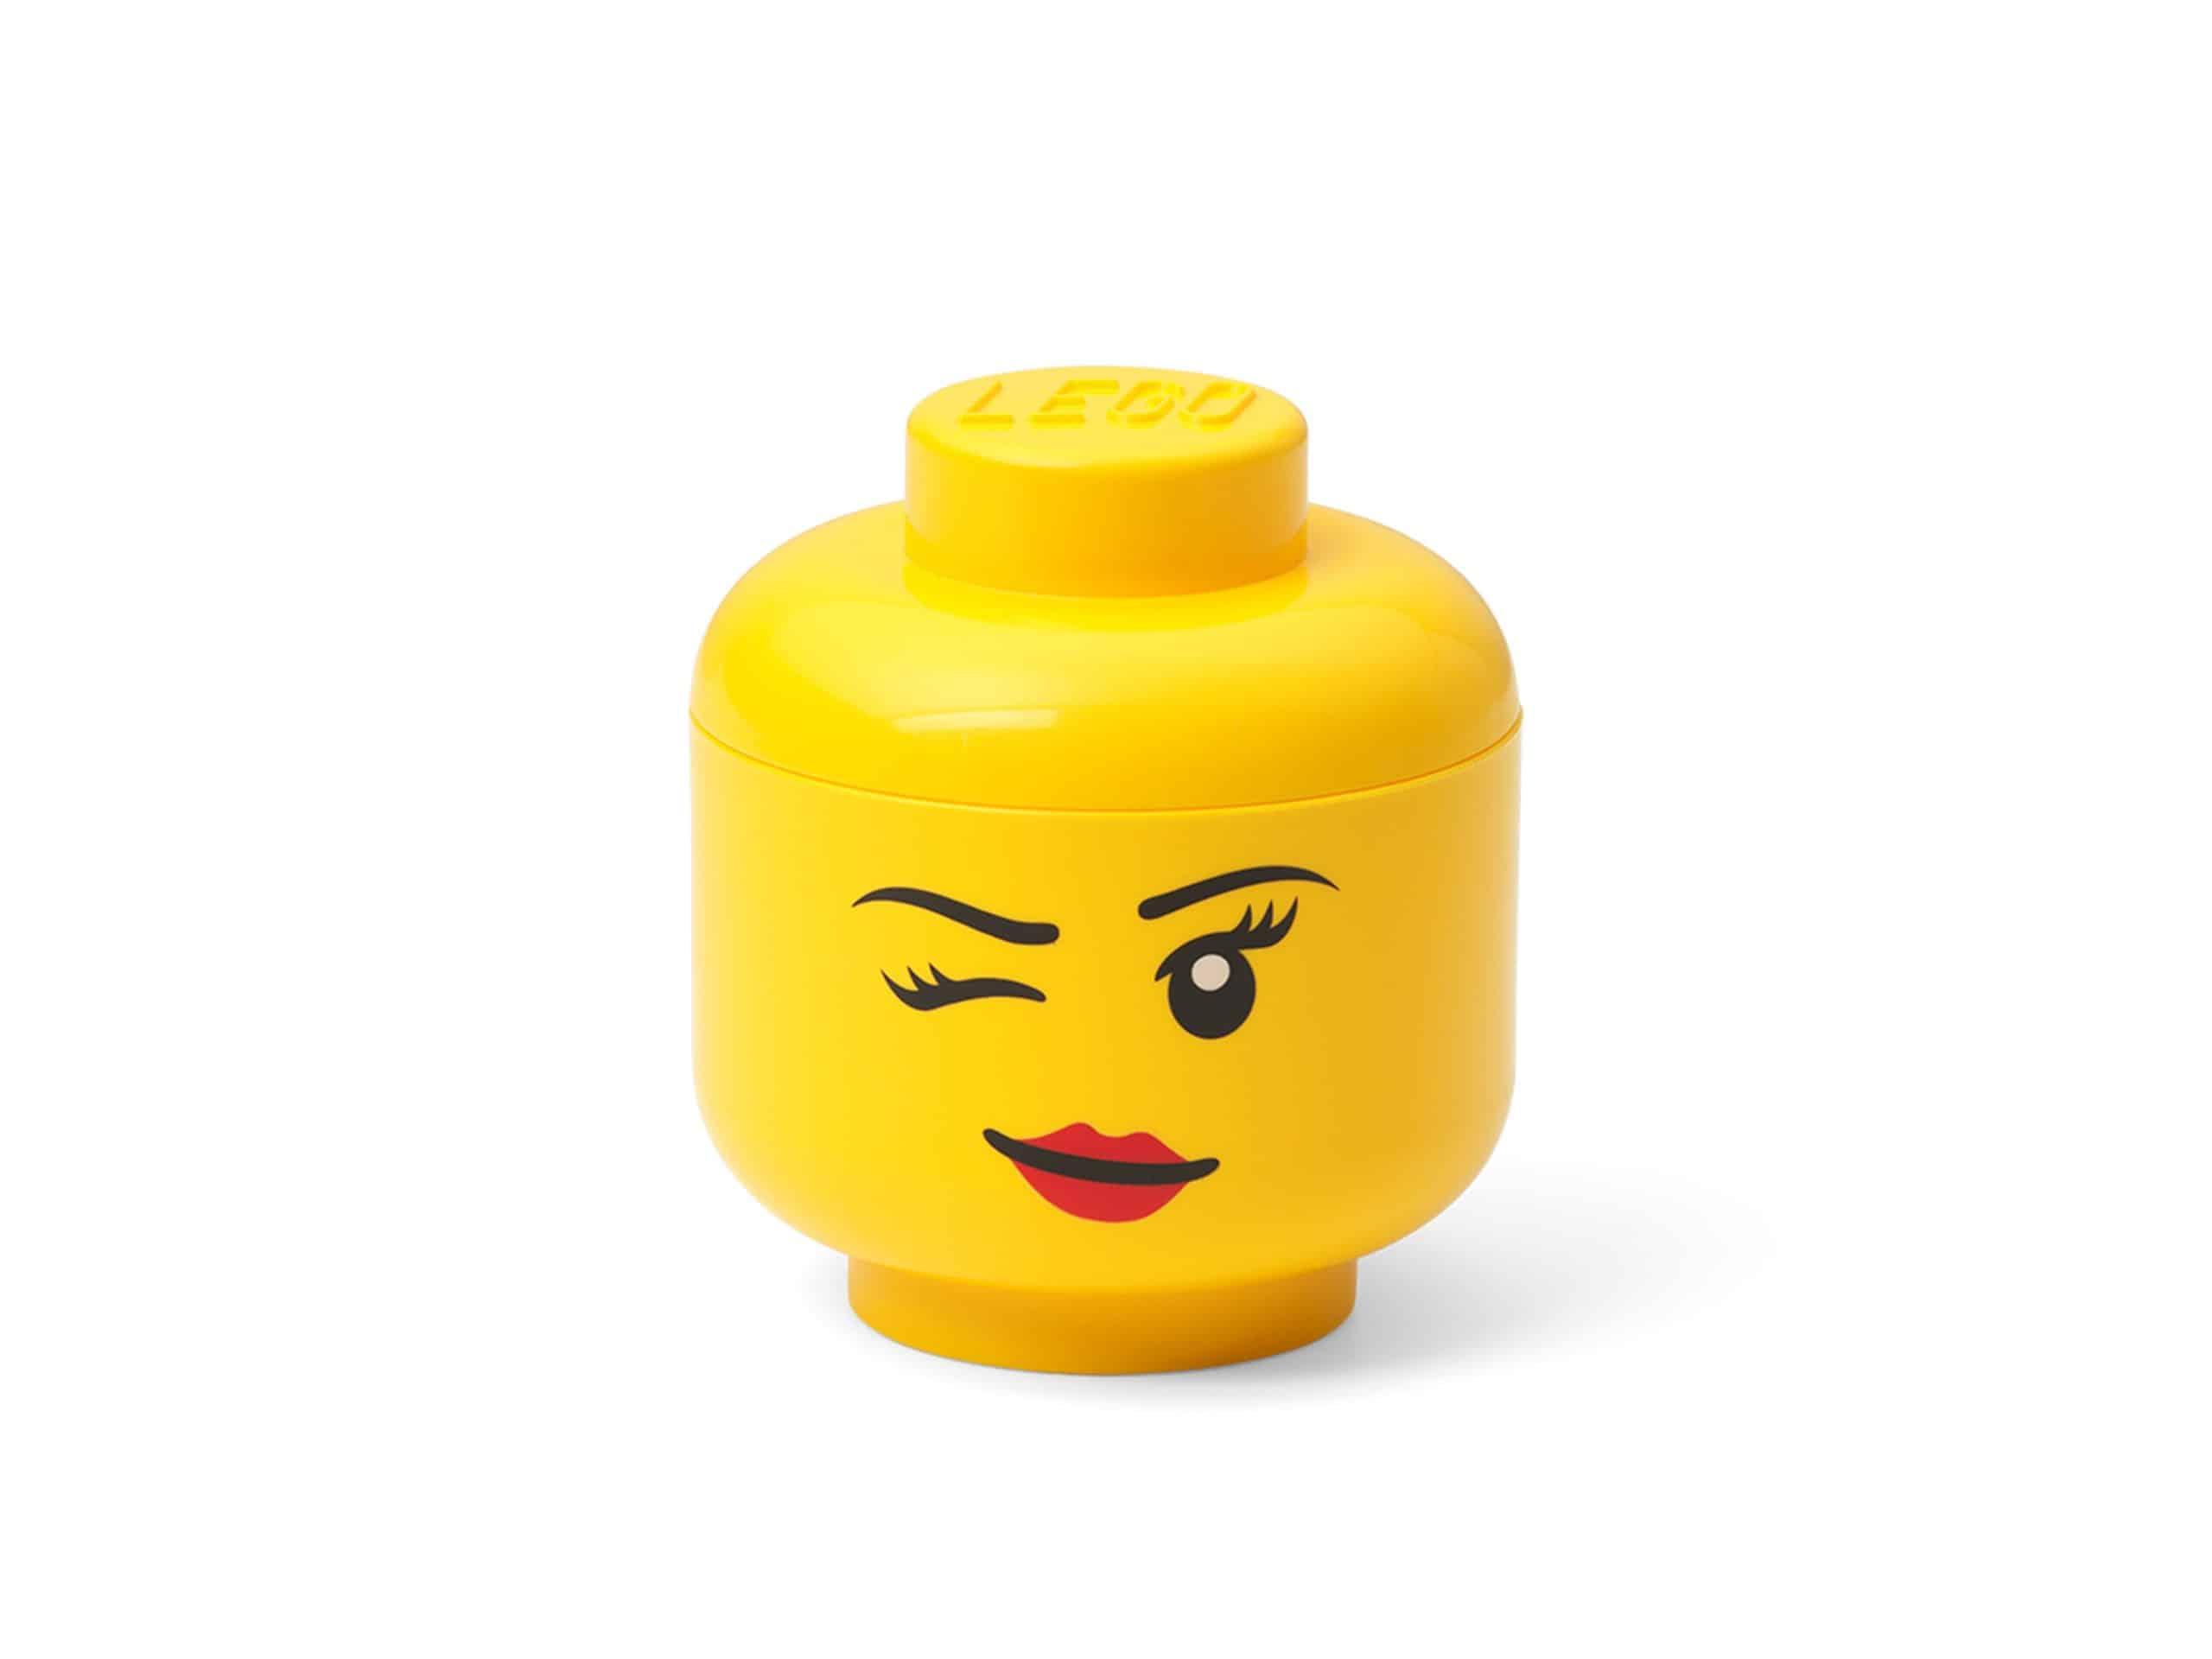 lego opberghoofd klein knipogend 5006211 scaled